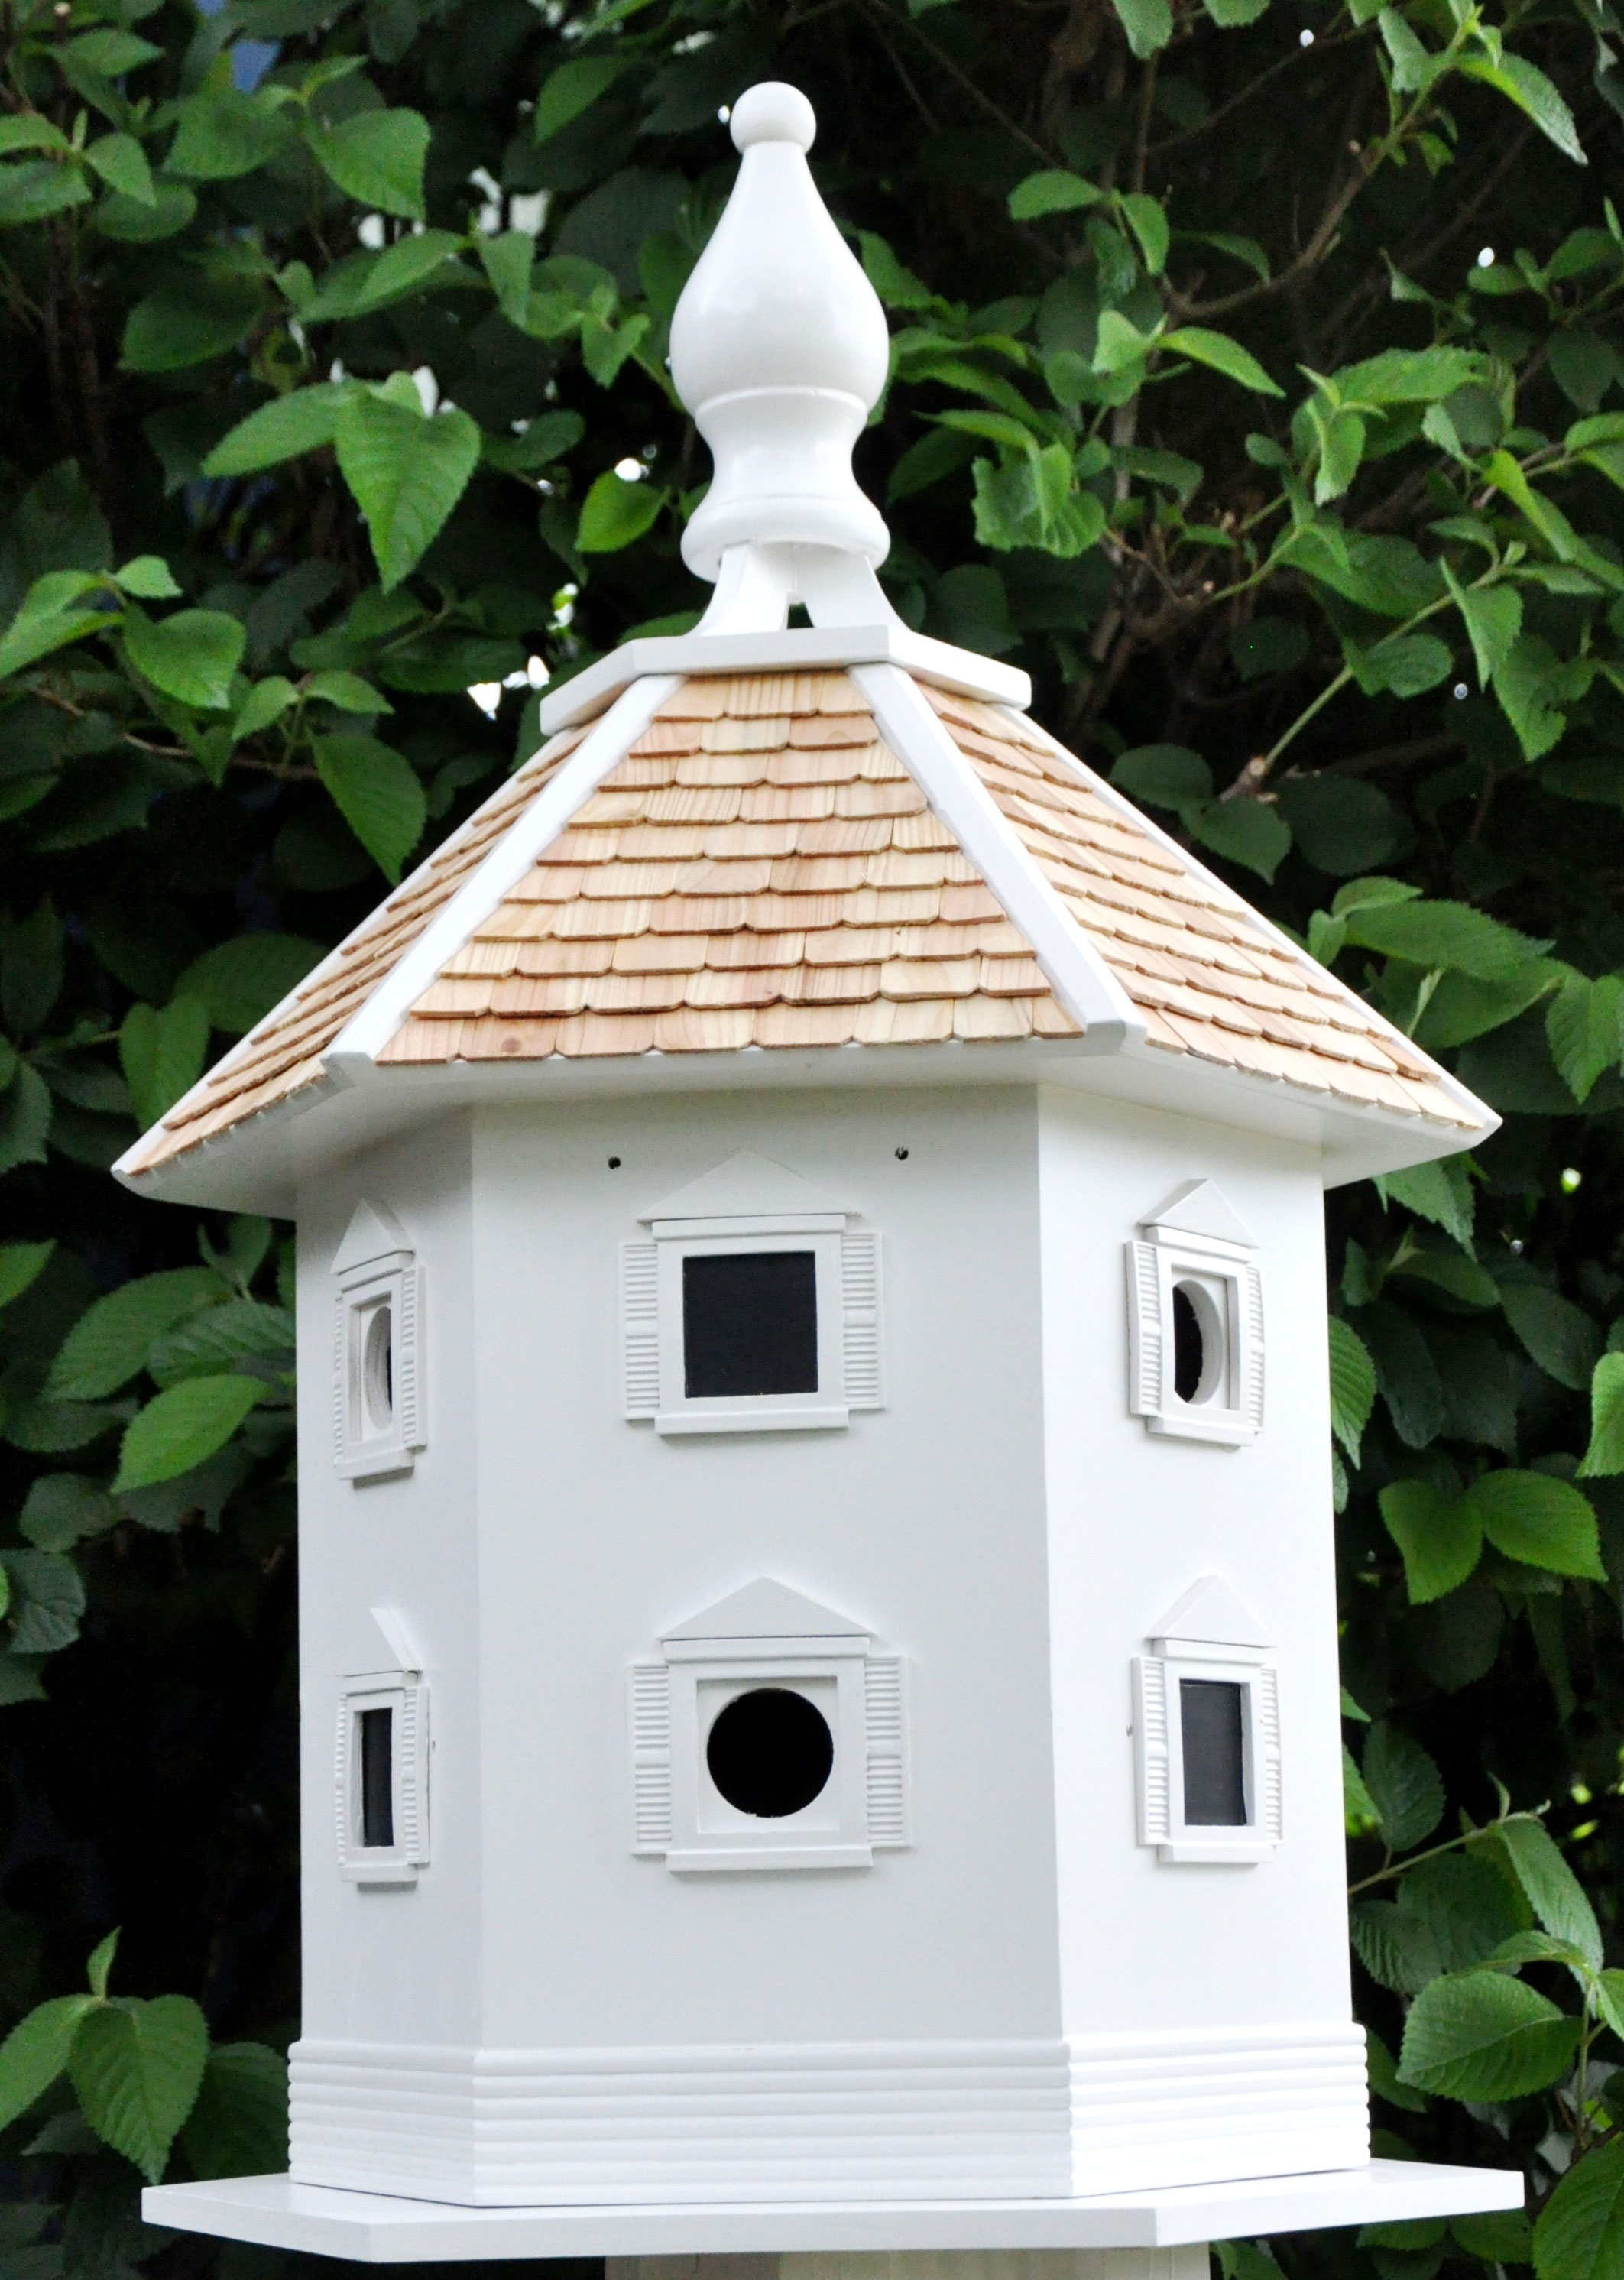 White Danbury DoveCote 6 Room Bird House  Yard Envy